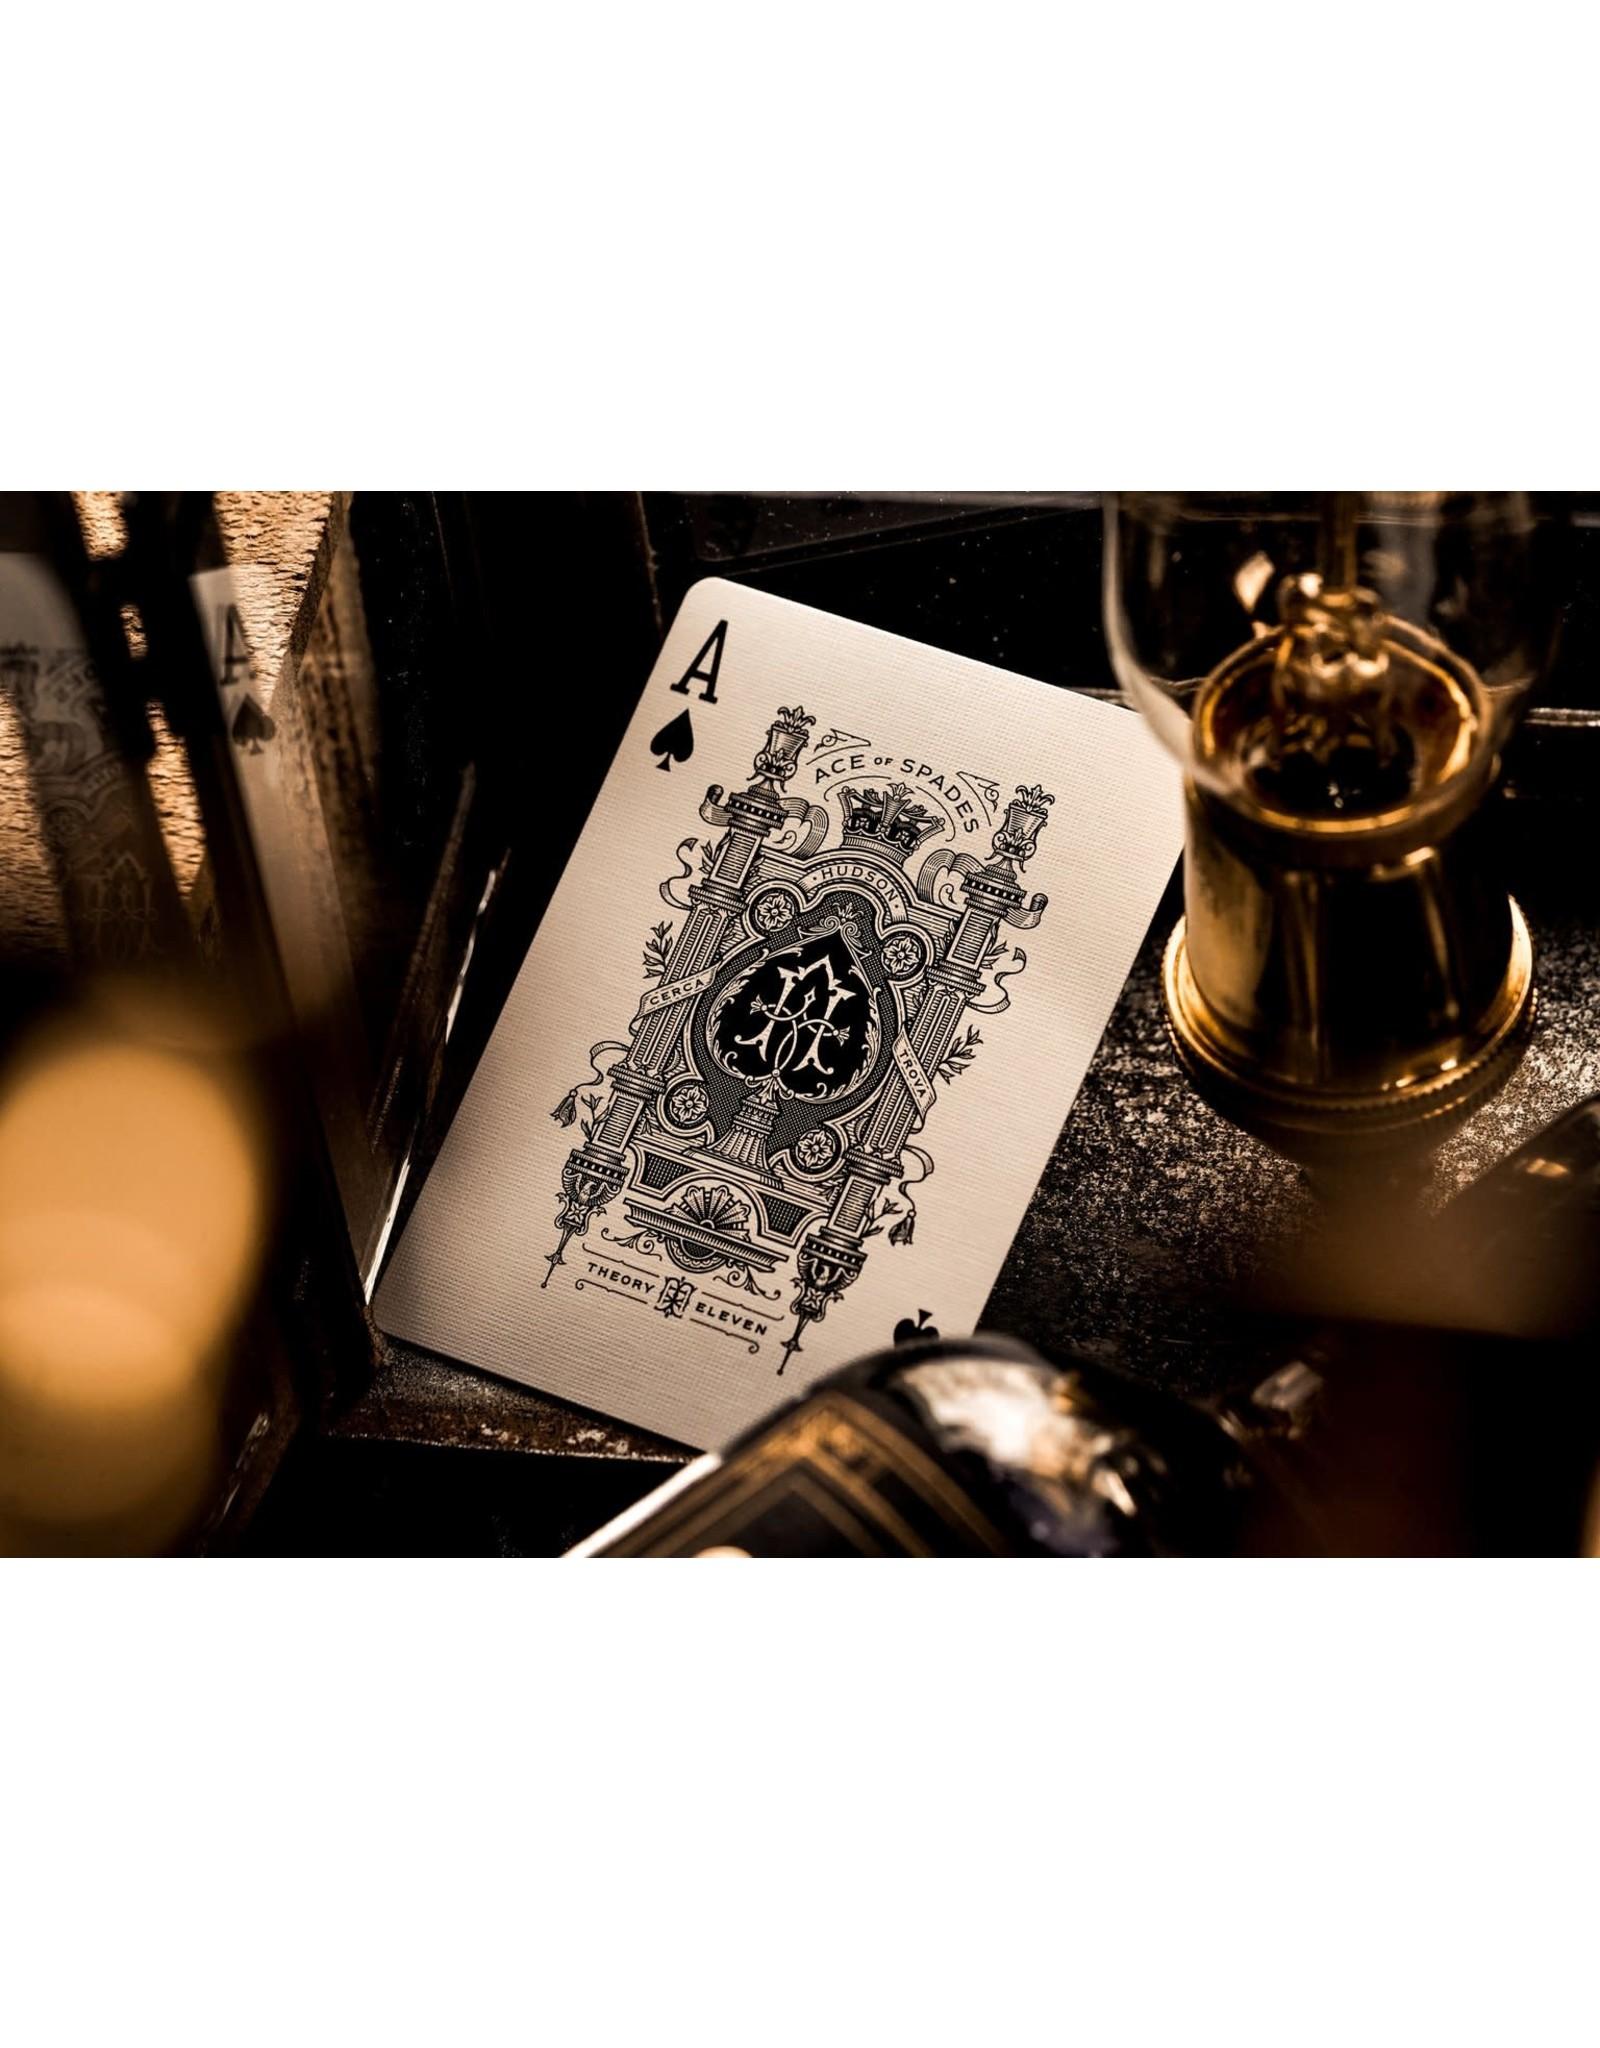 Theory 11 Black Hudson Playing Cards